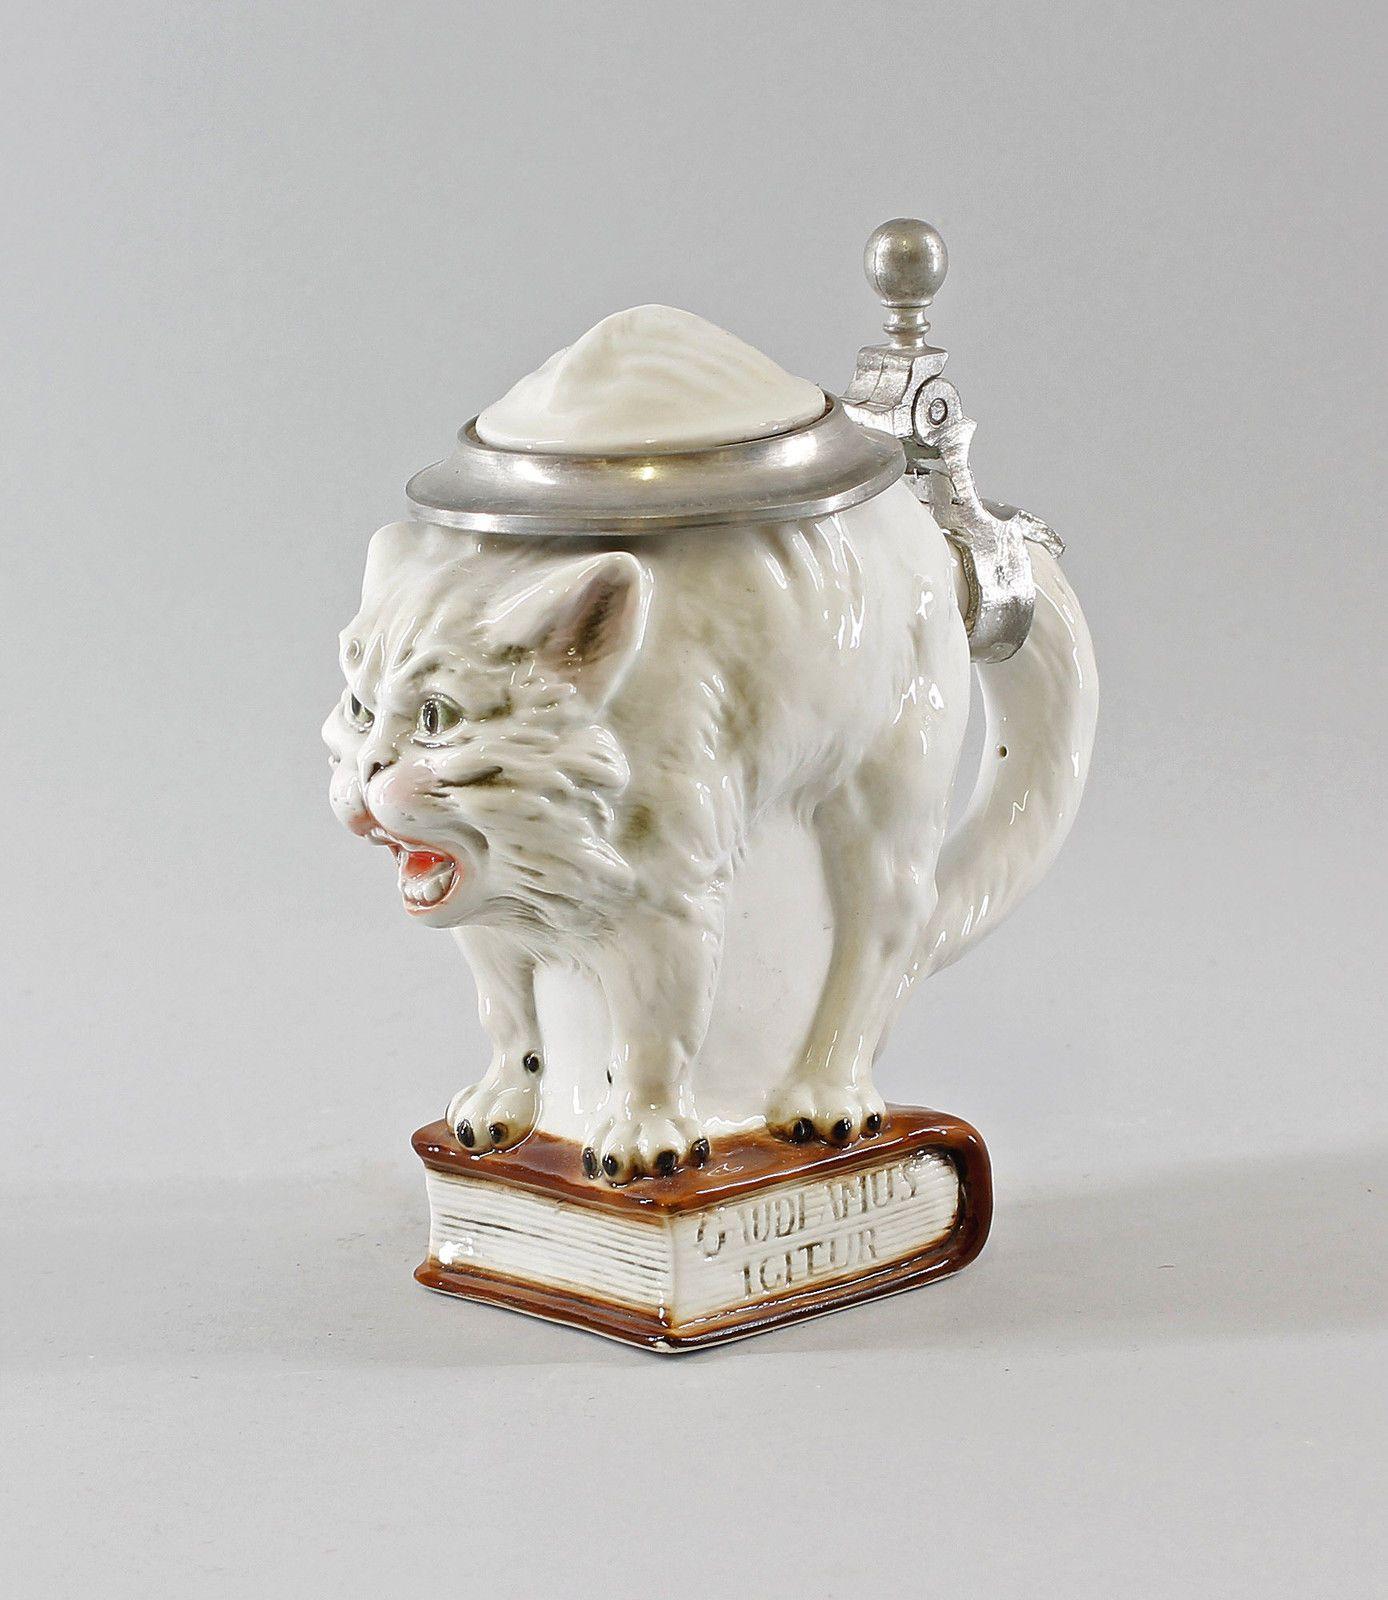 Porzellan Ernst Bohne Thüringen Bierkrug Humpen Katze 0,25l 9941772 in Antiquitäten & Kunst, Porzellan & Keramik, Porzellan | eBay